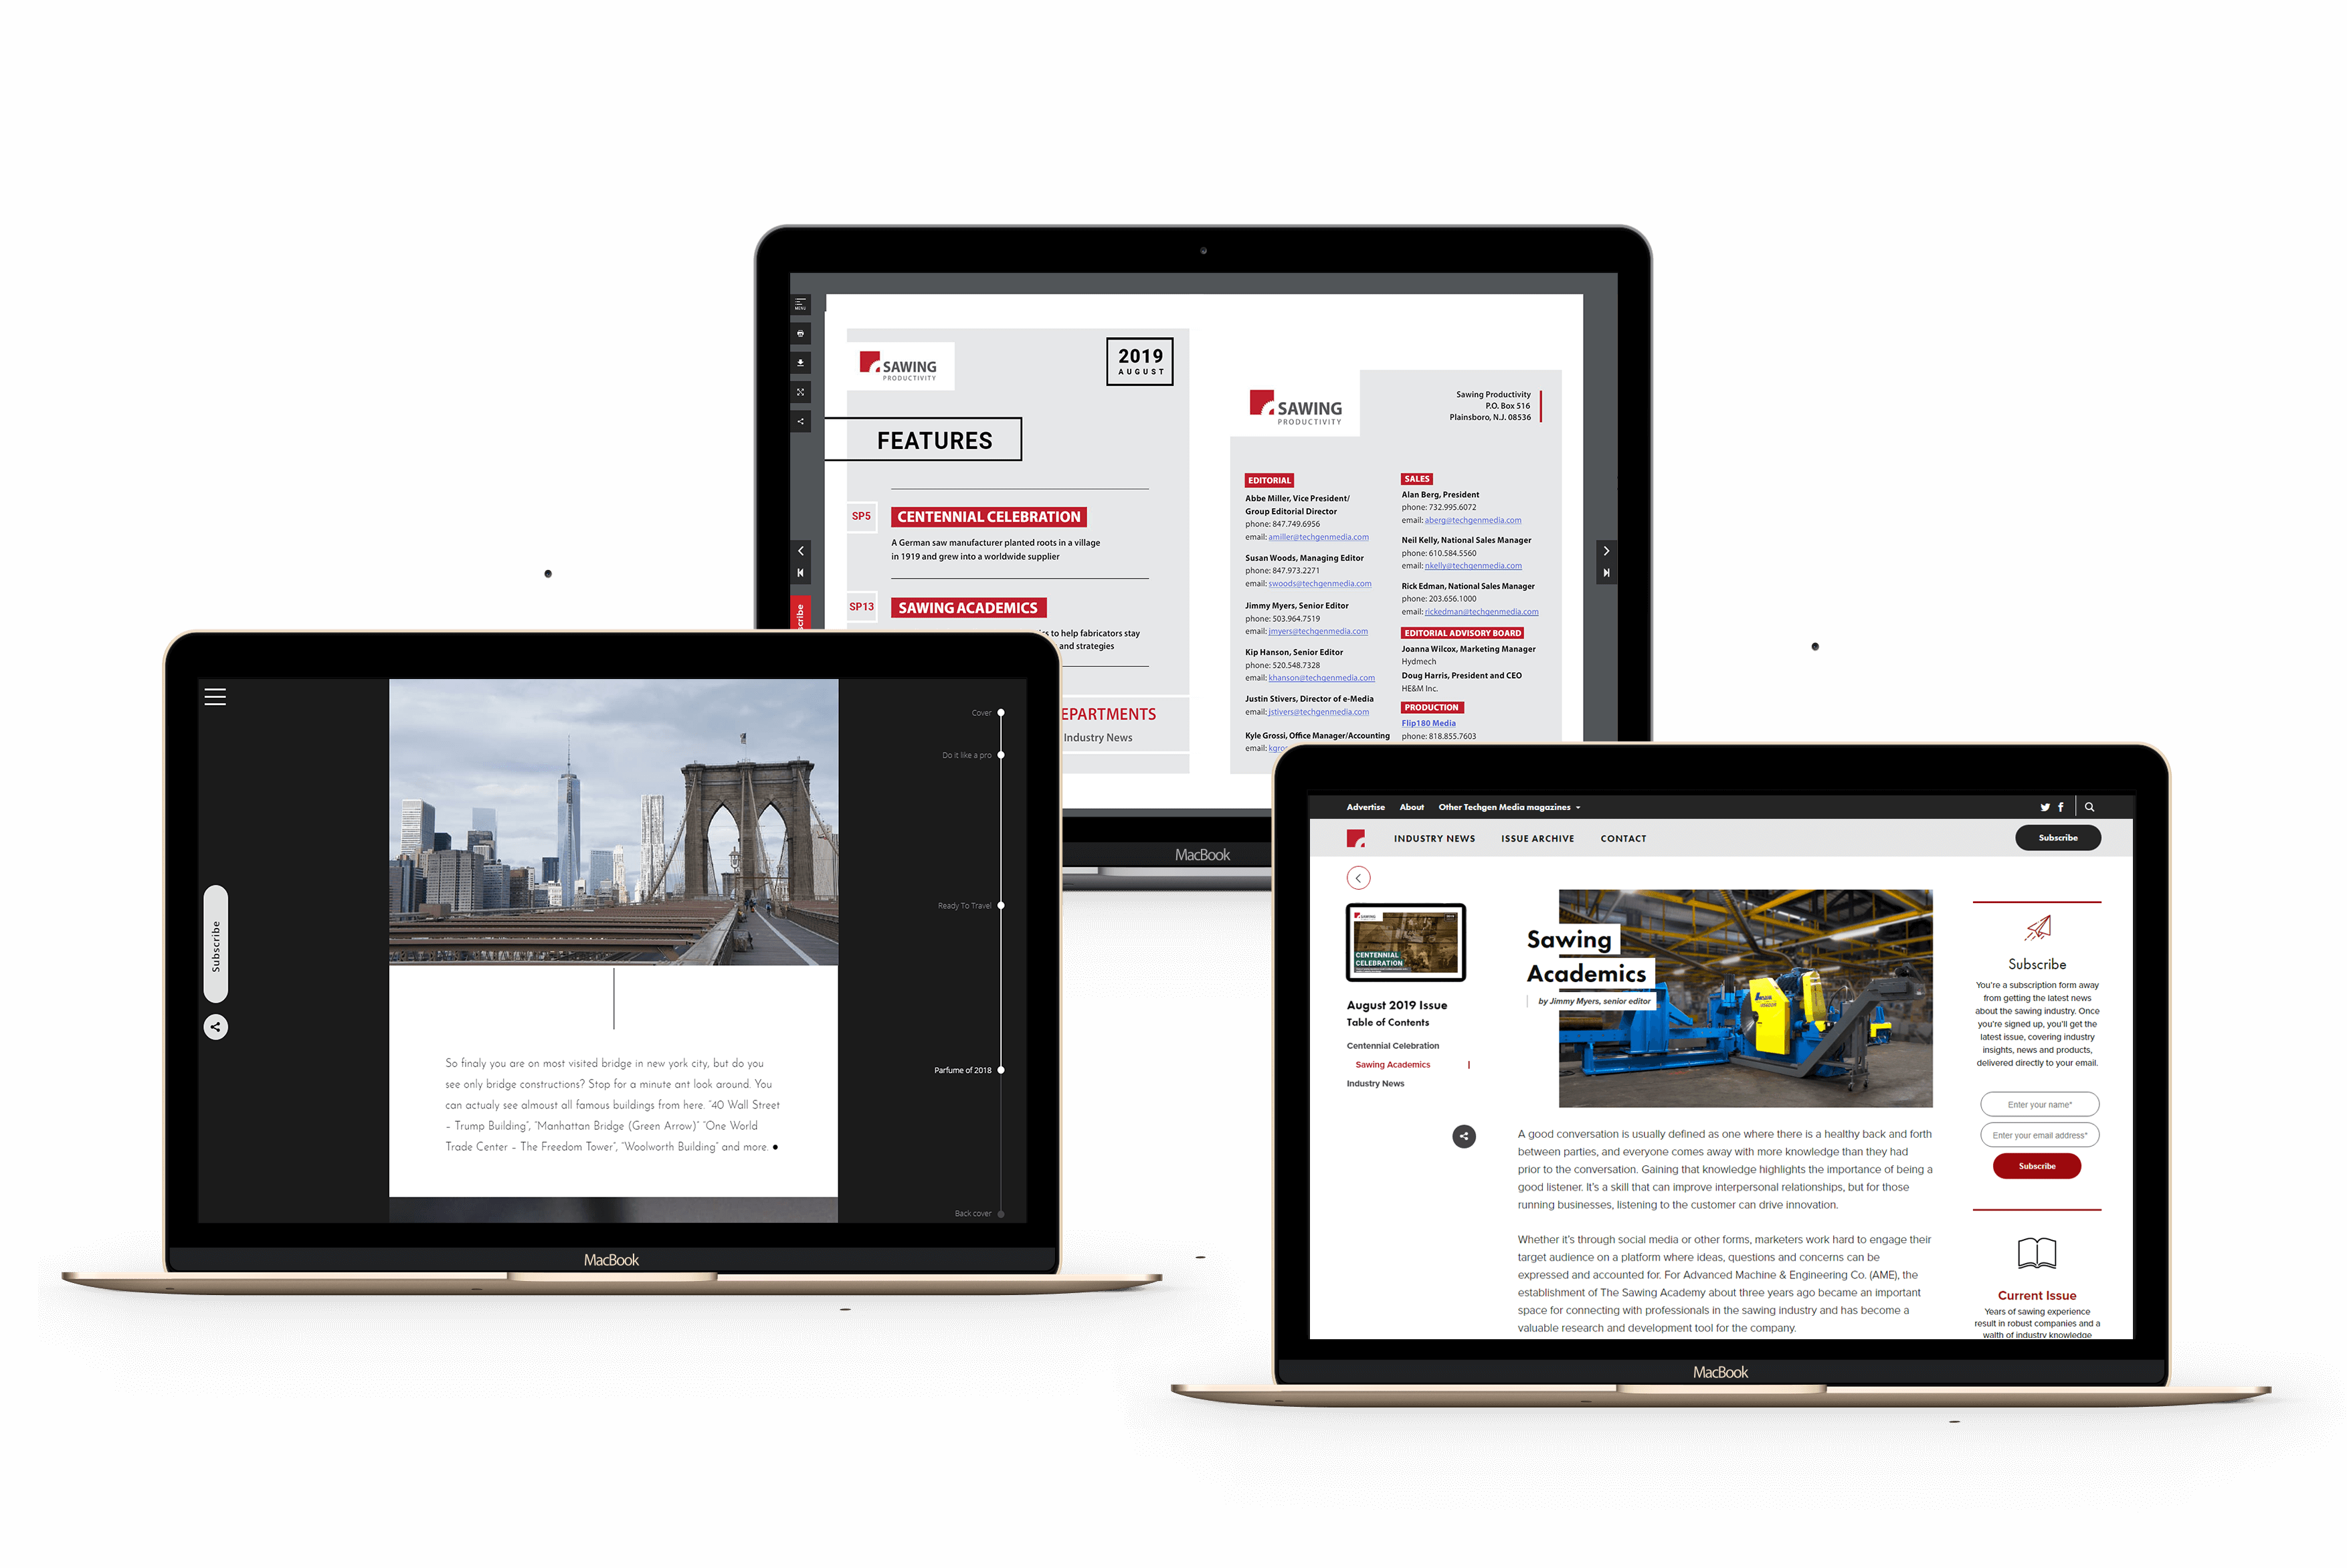 Web design and WebDev publishing tools